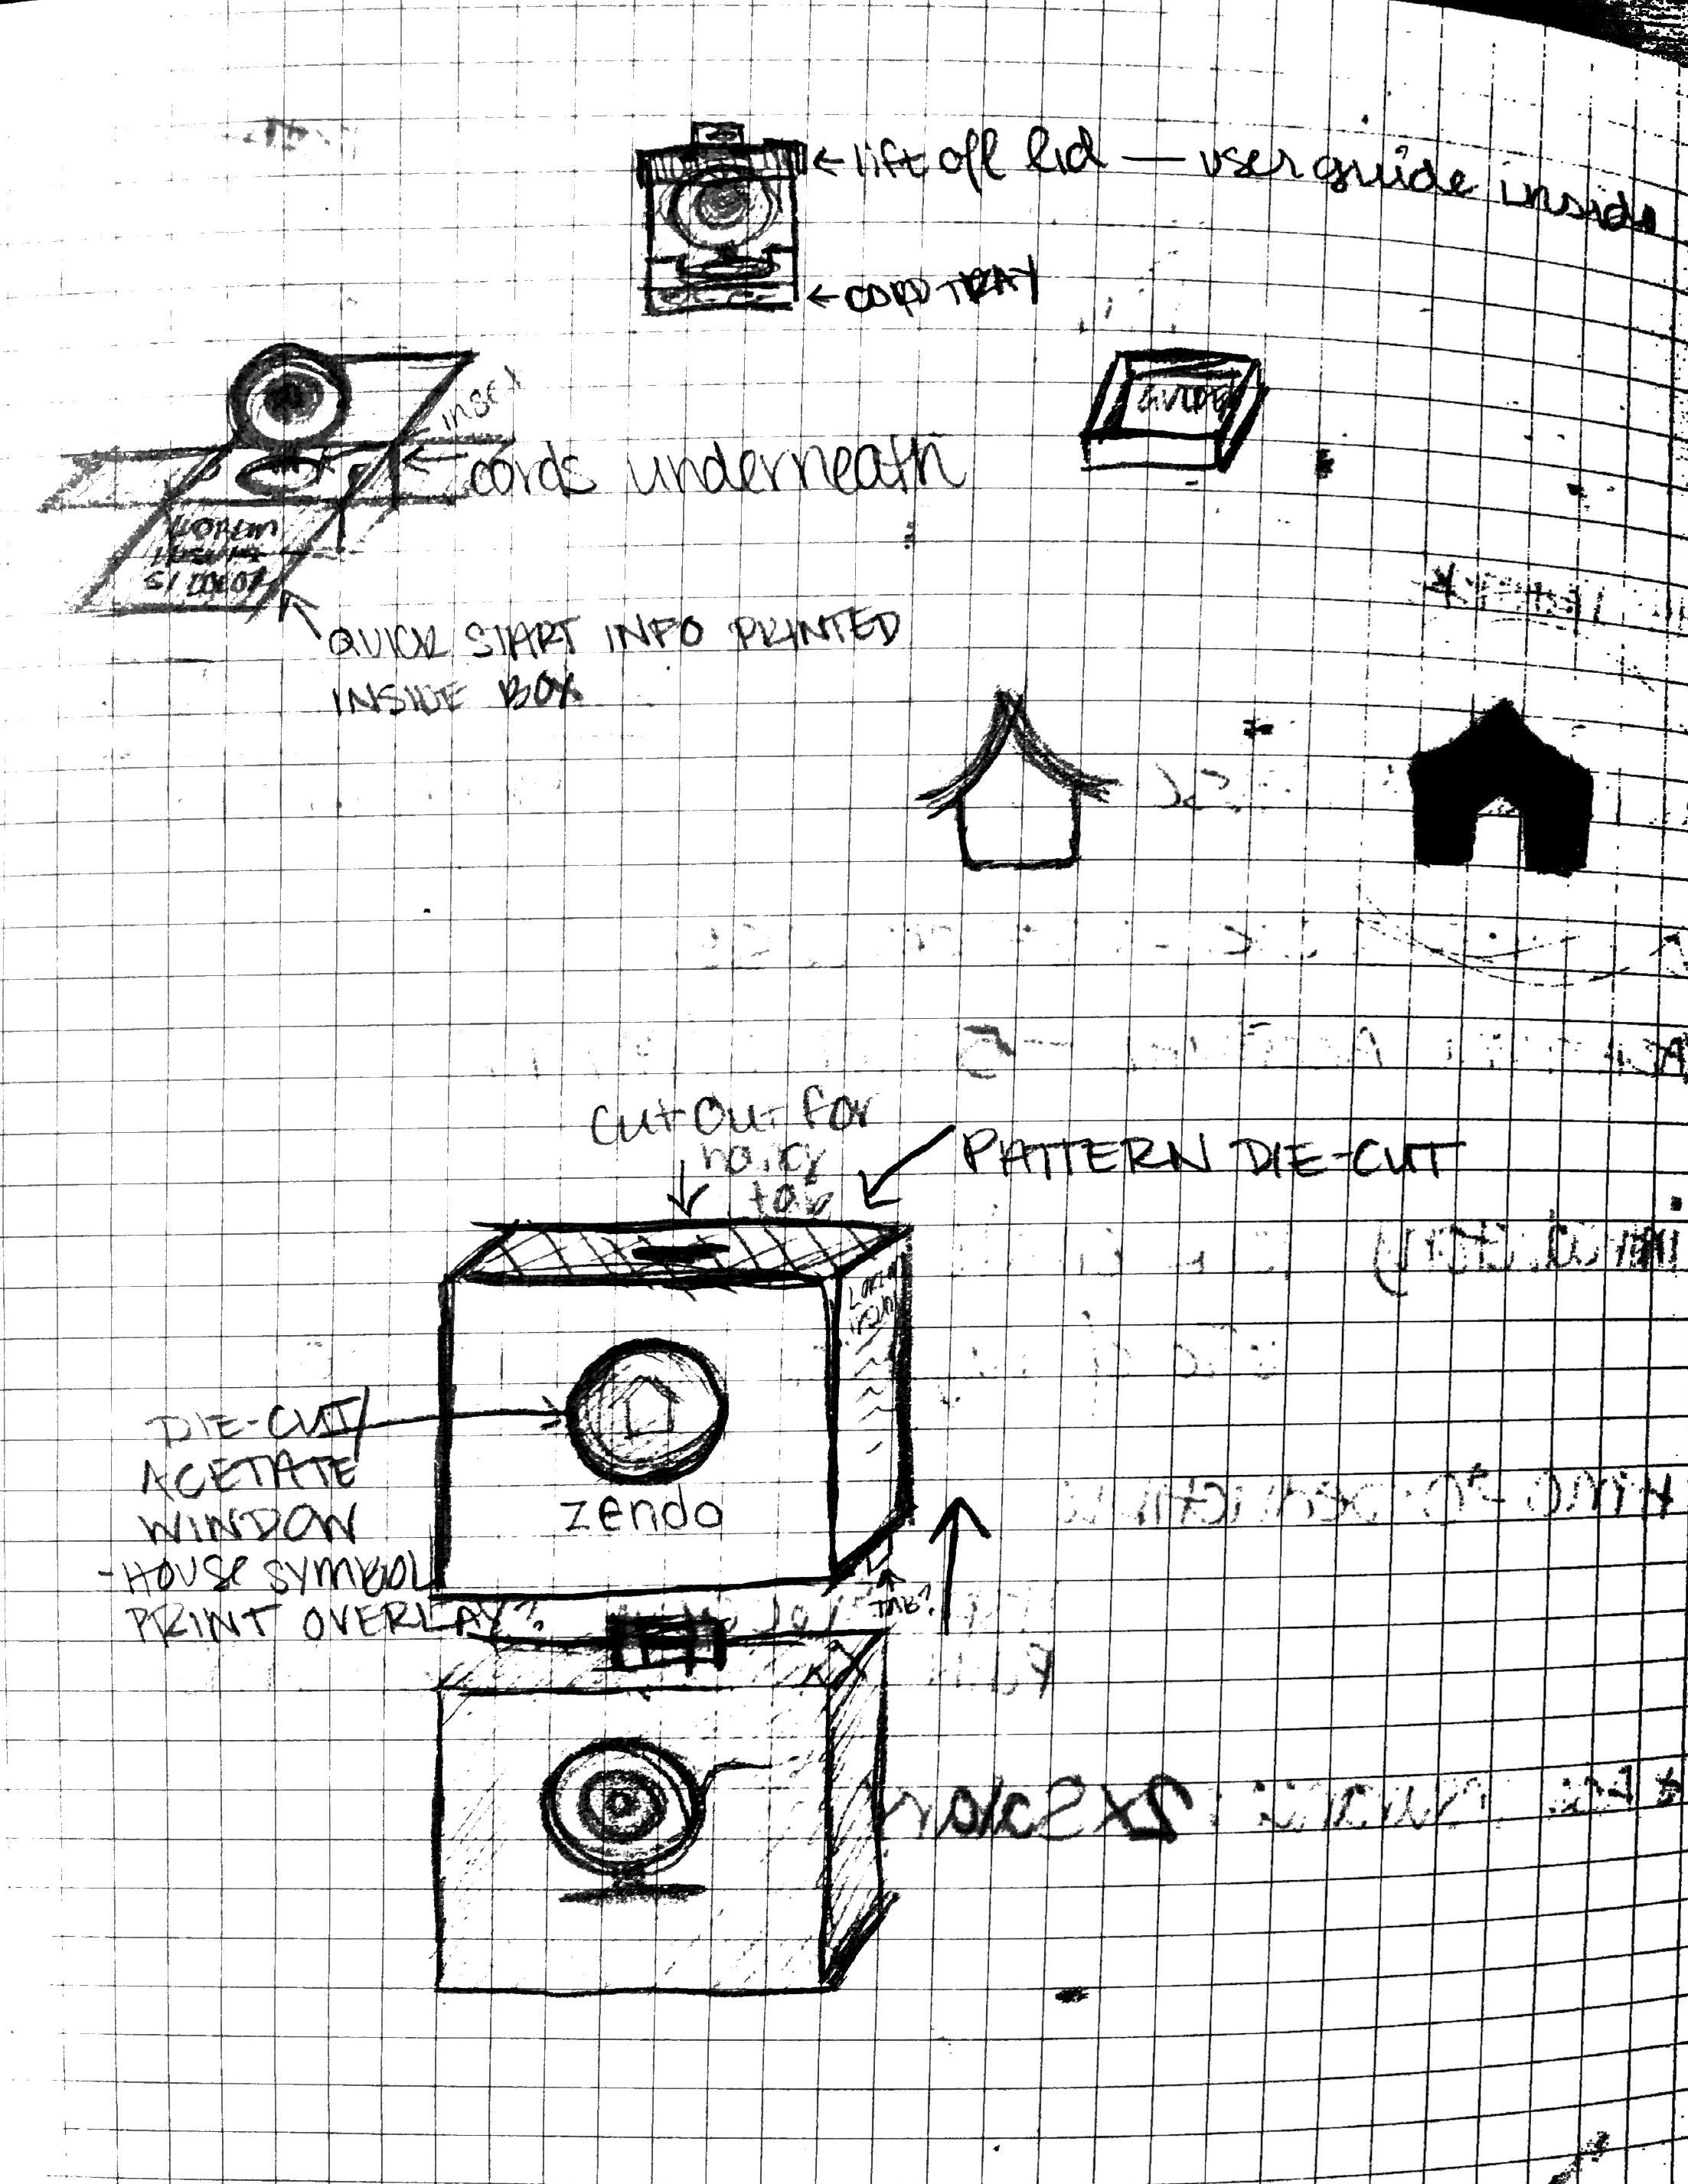 Zendo-Packaging7.jpg